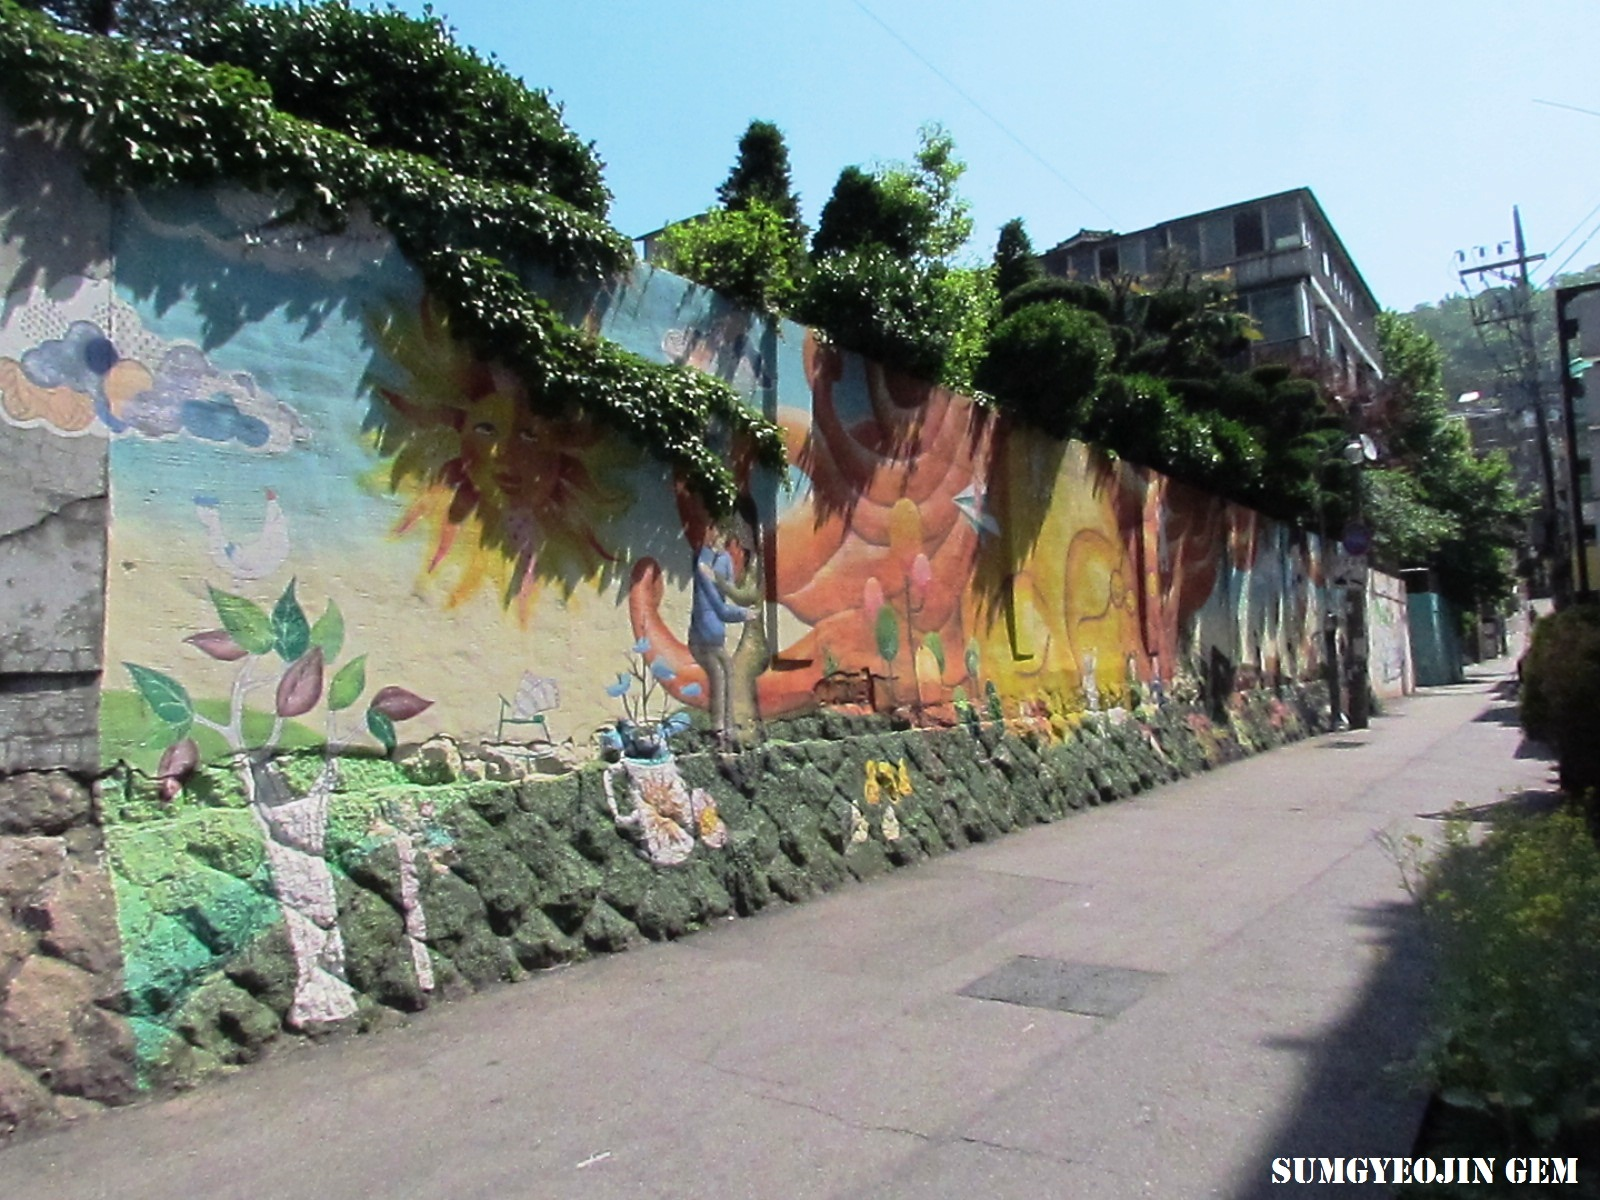 Dreamlike mural at ihwa mural village sumgyeojin gem for Mural village